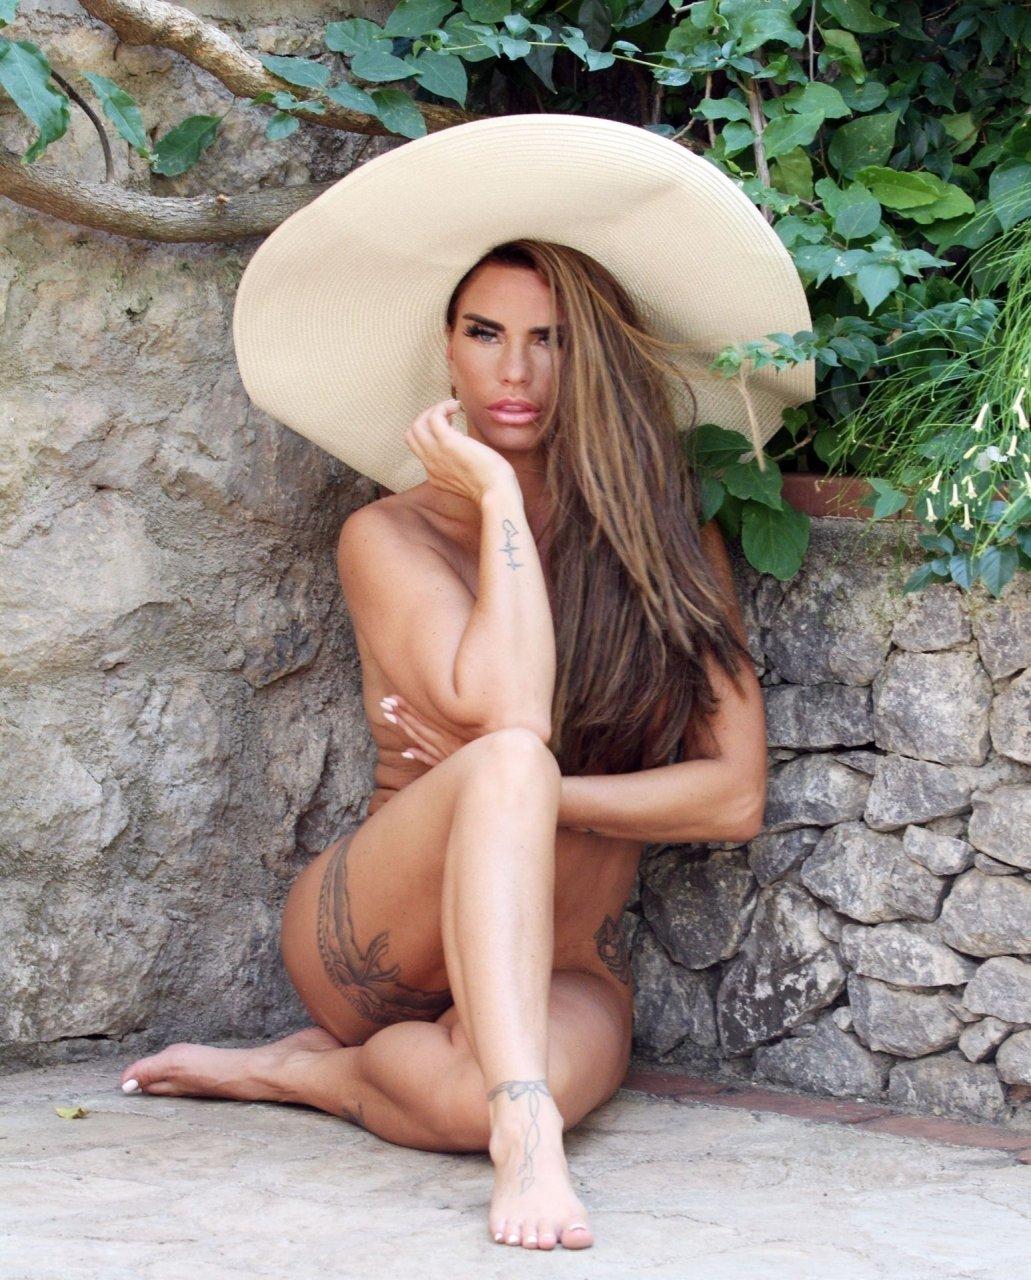 Katie-Price-Nude-Sexy-TheFappeningBlog.com-97.jpg